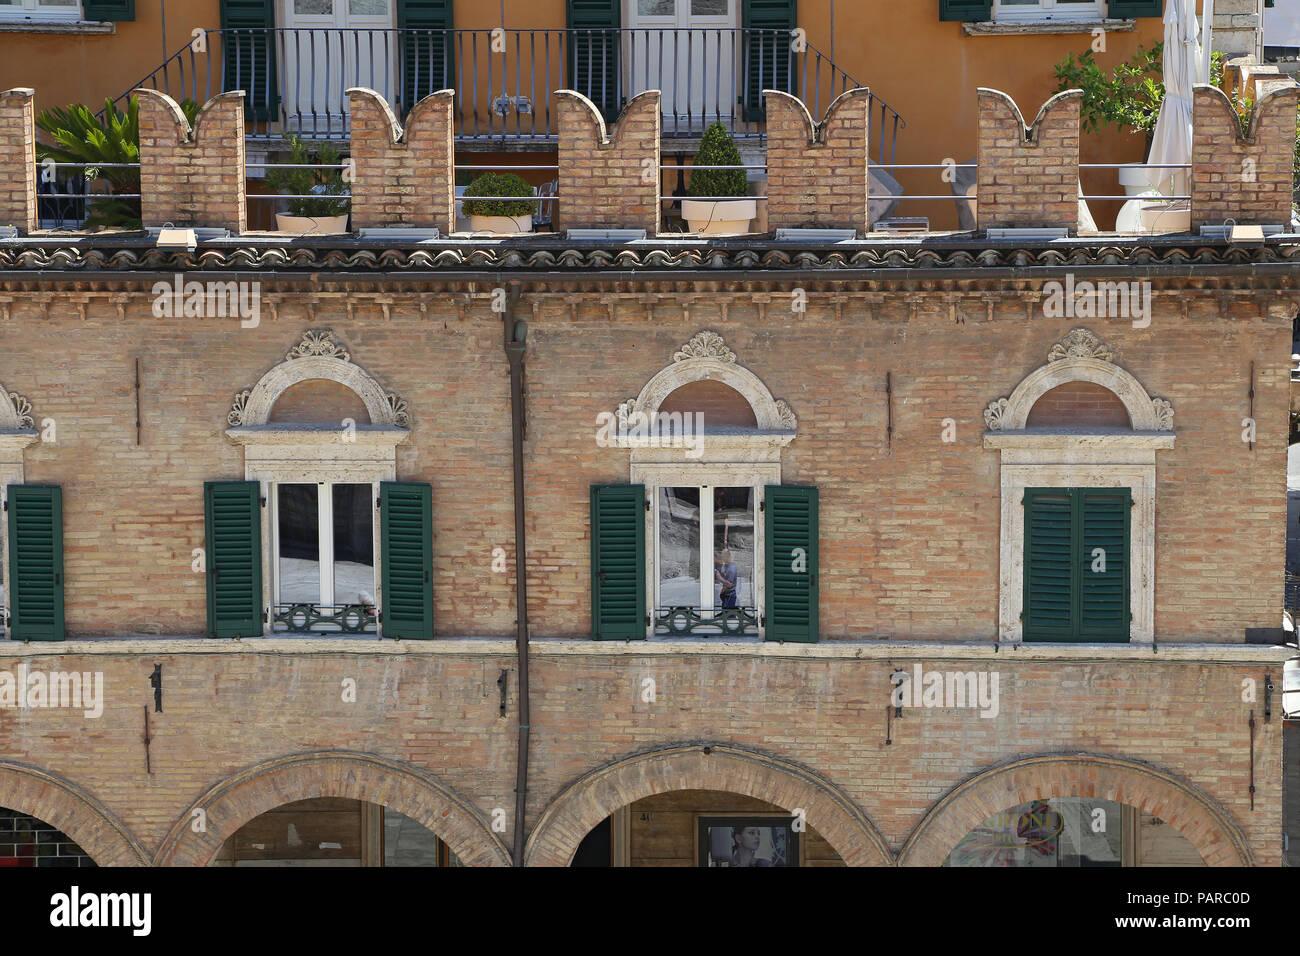 Ascoli Piceno (Marches, Italy) - Ancient building in the main square - Stock Image